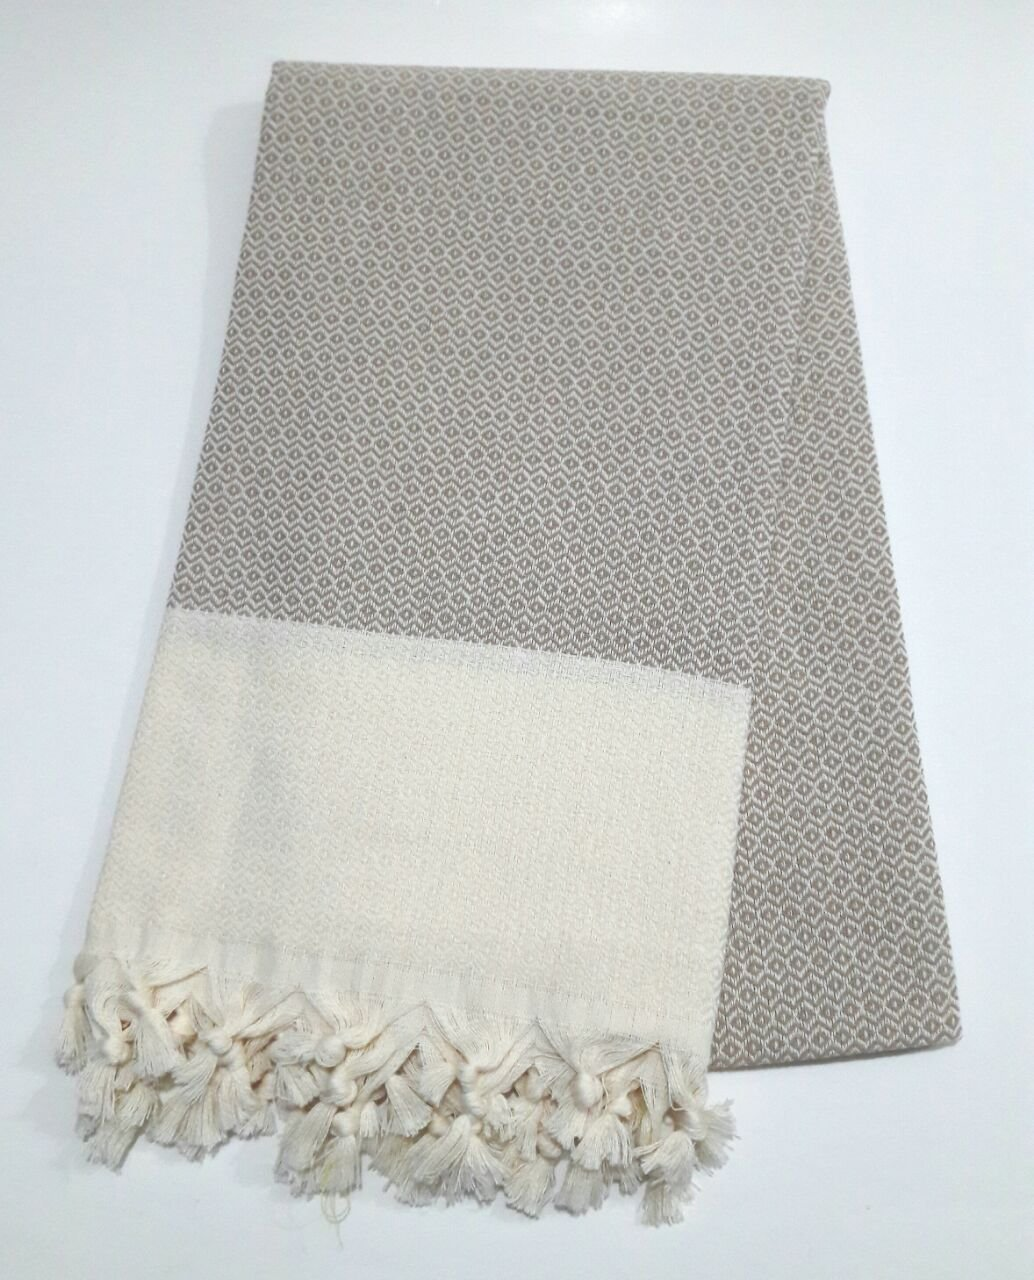 "Paramus %100 Turkish Cotton Peshtemal Peshtemal Towels, Hamam Towel Wrap Pareo Fouta Throw Peshtemal (37x""70"") (1, sand) - 100% COTTON Made in Turkey 95x175 cm (""37x70"" inches) - bathroom-linens, bathroom, bath-towels - 71NJNg7GMiL -"